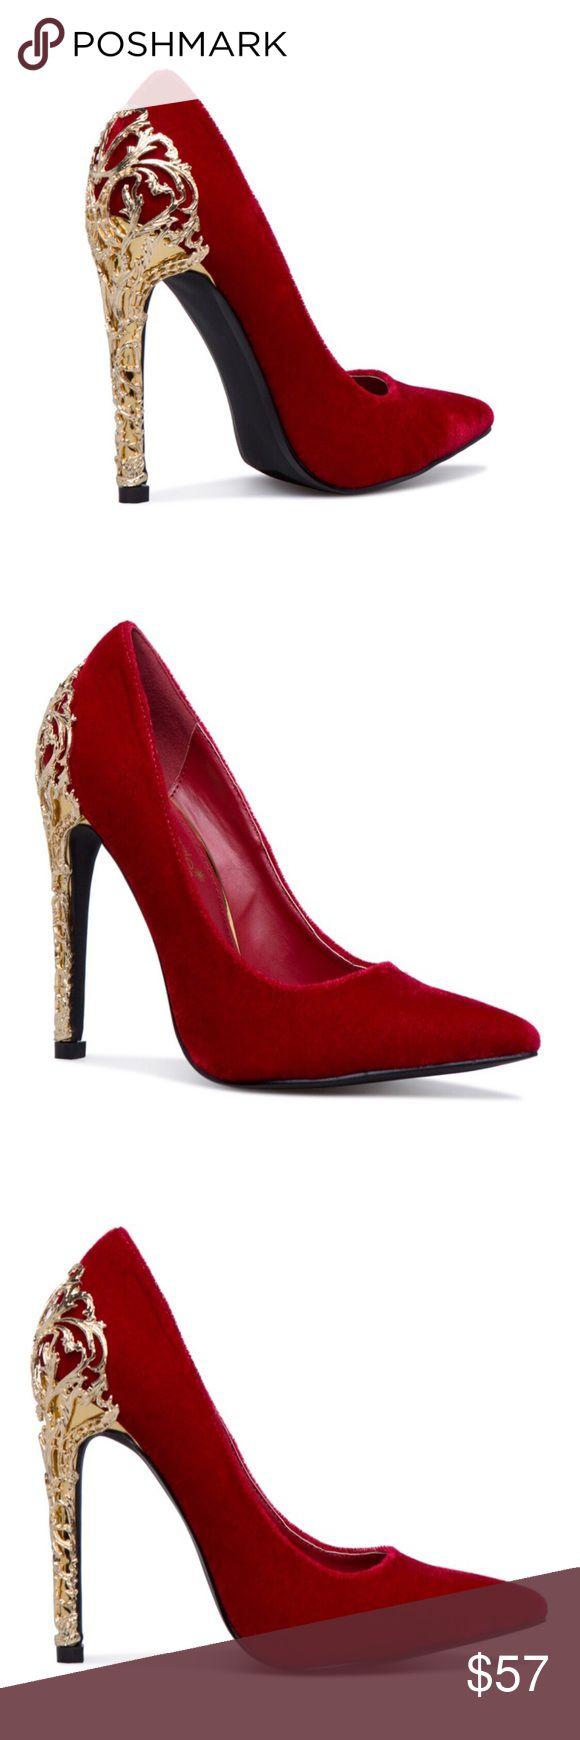 NEVER USED, Shoe Dazzle Krya Pumps size 7.5 Shoe Dazzle, Krya Pumps. Heel size 4 1/2                                                                                                                                                                                                                                                                     Fast shipper  Accept reasonable offers  I do bundle discounts too                                              No trades Shoe Dazzle Shoes Heels